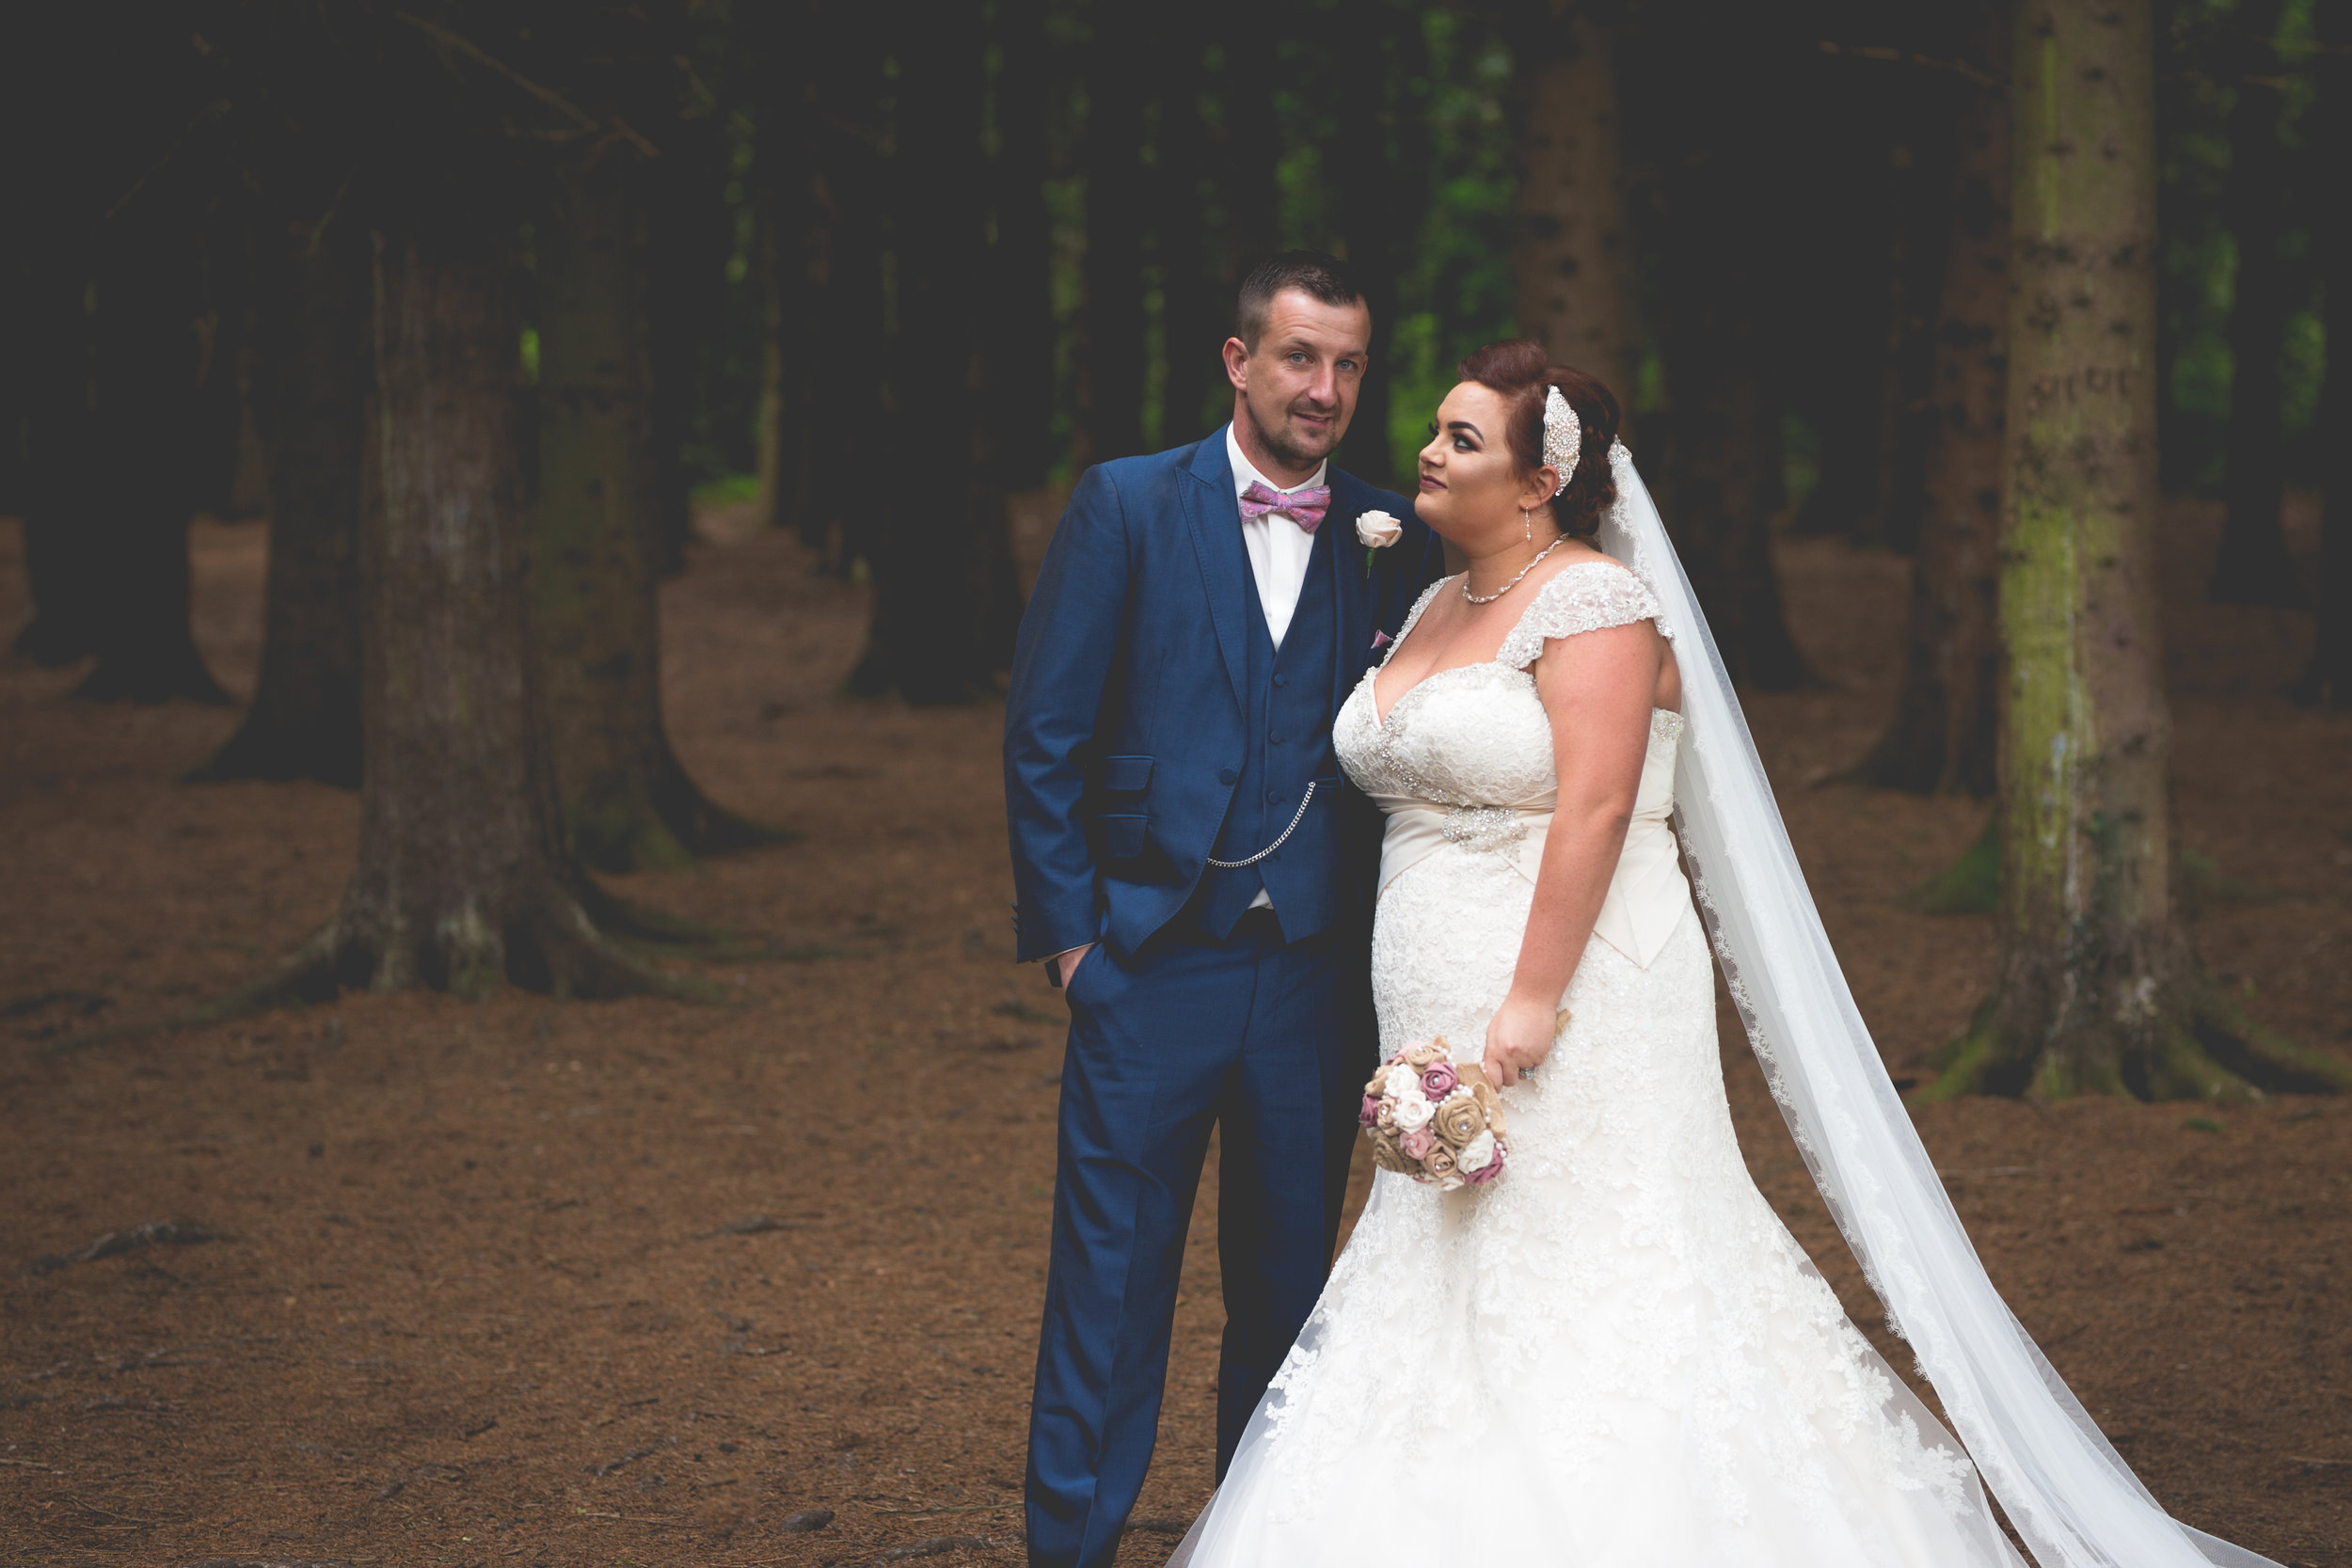 Antoinette & Stephen - Portraits   Brian McEwan Photography   Wedding Photographer Northern Ireland 25.jpg